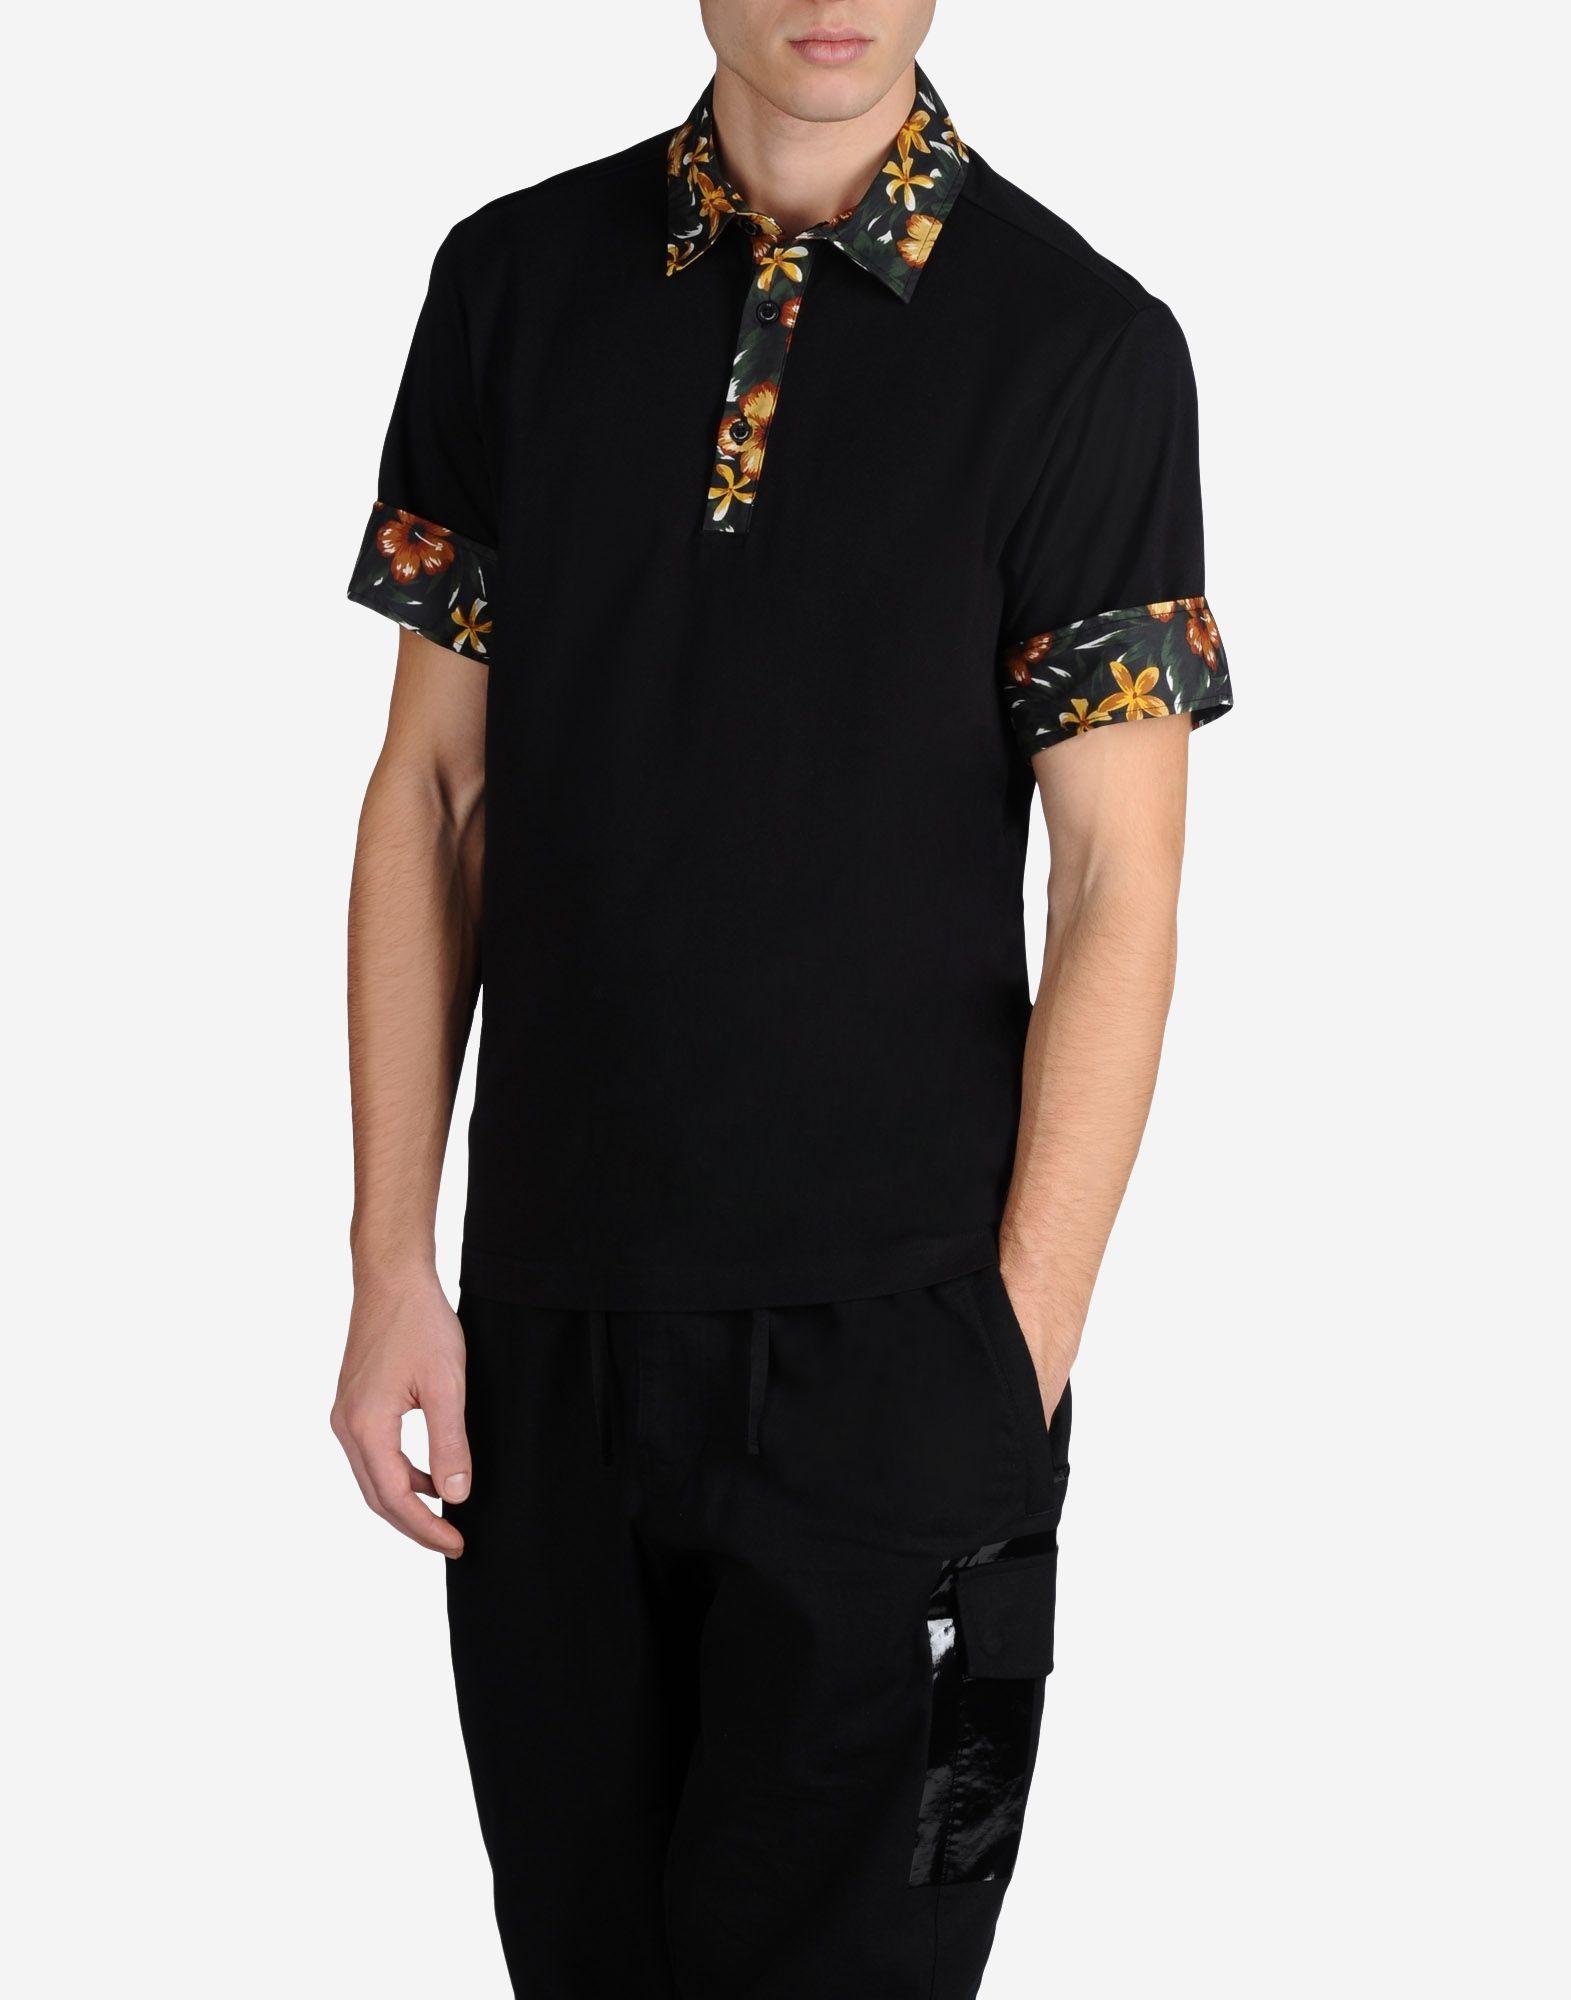 338d05bf2fa1 ... Y-3 Y-3 Aloha Polo Shirt Polo Man d ...